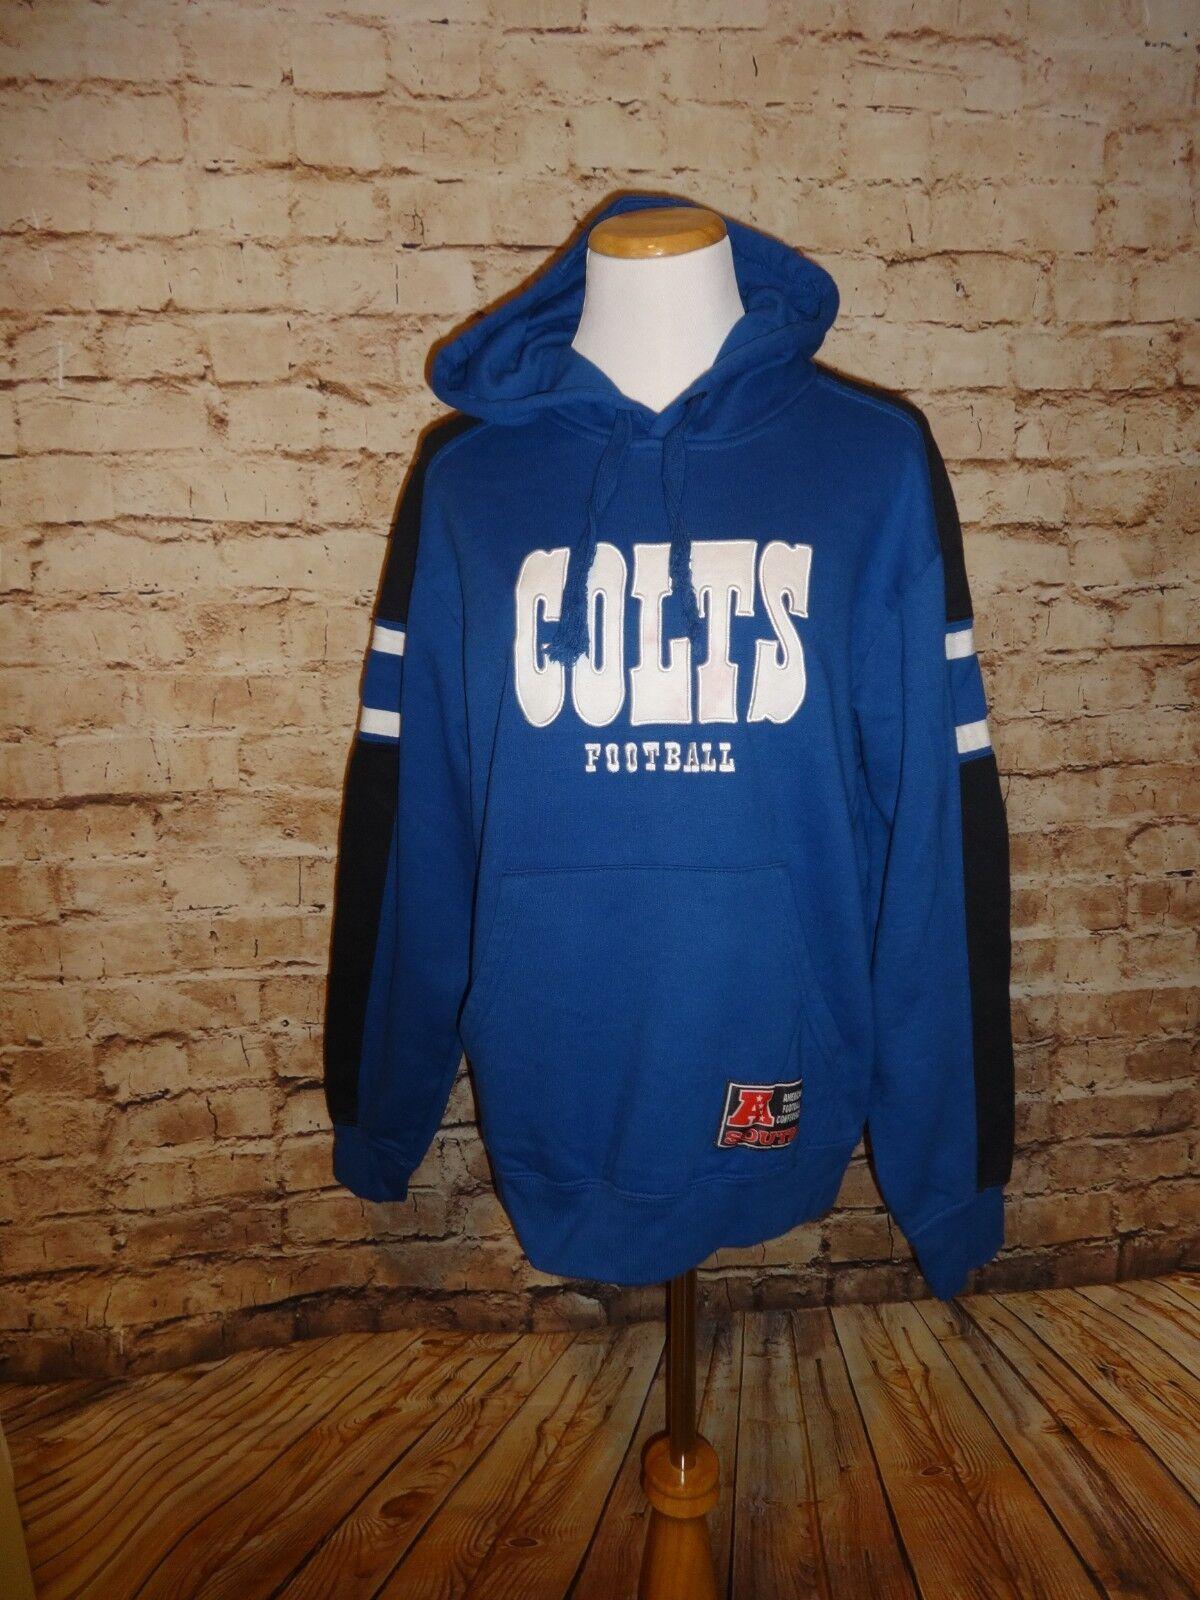 Colts Football  Hoodie Sweatshirt Unisex SZ S Hooded Top Blau NFL Team Apparel